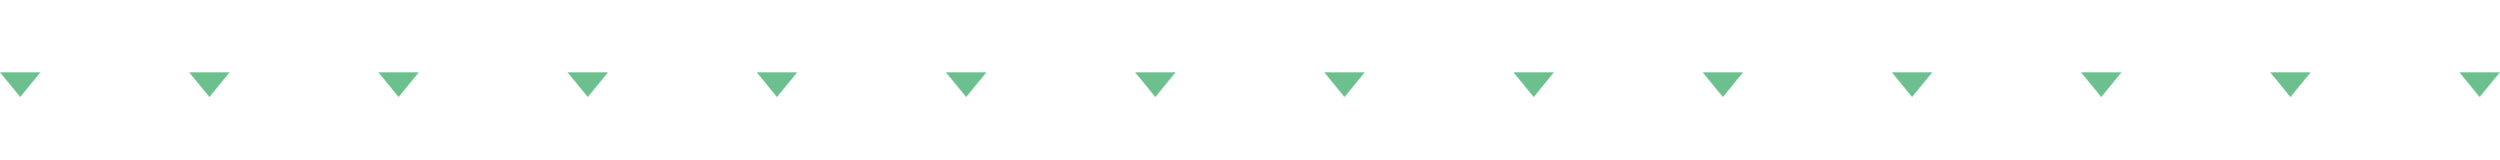 King_linear pattern-04-04.png